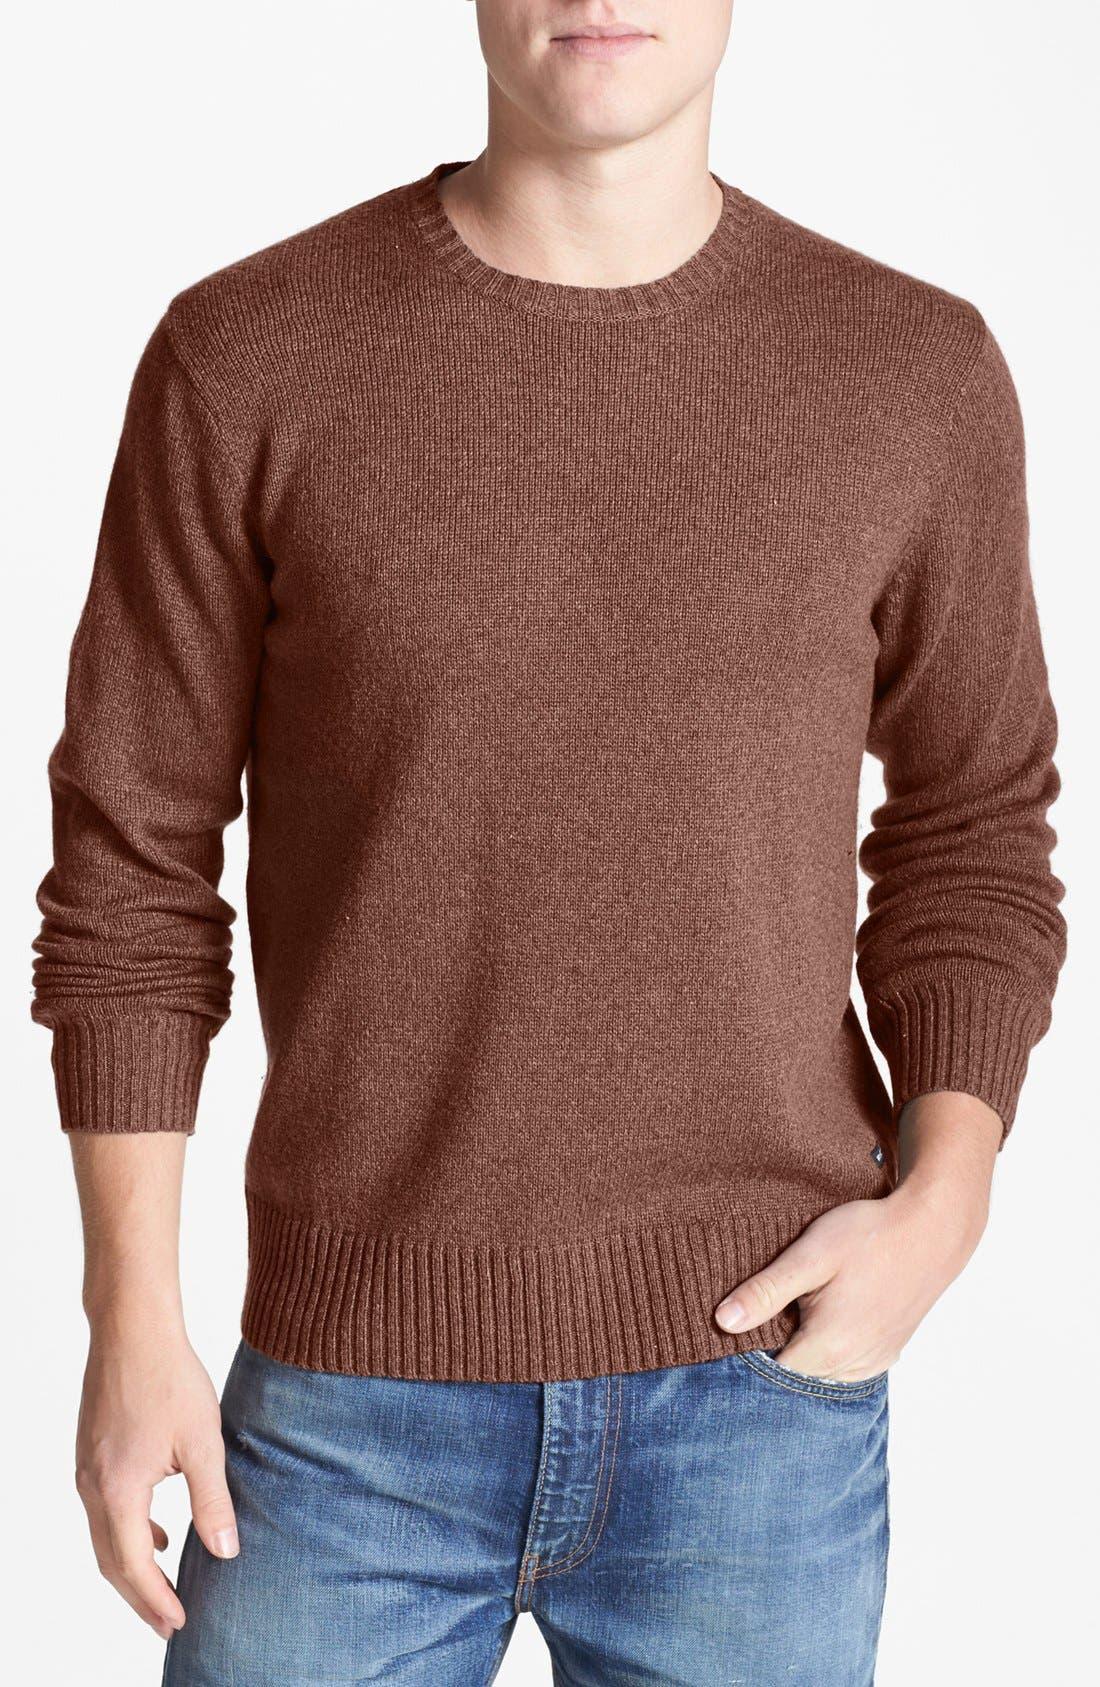 Main Image - RVCA 'Briza' Crewneck Sweater